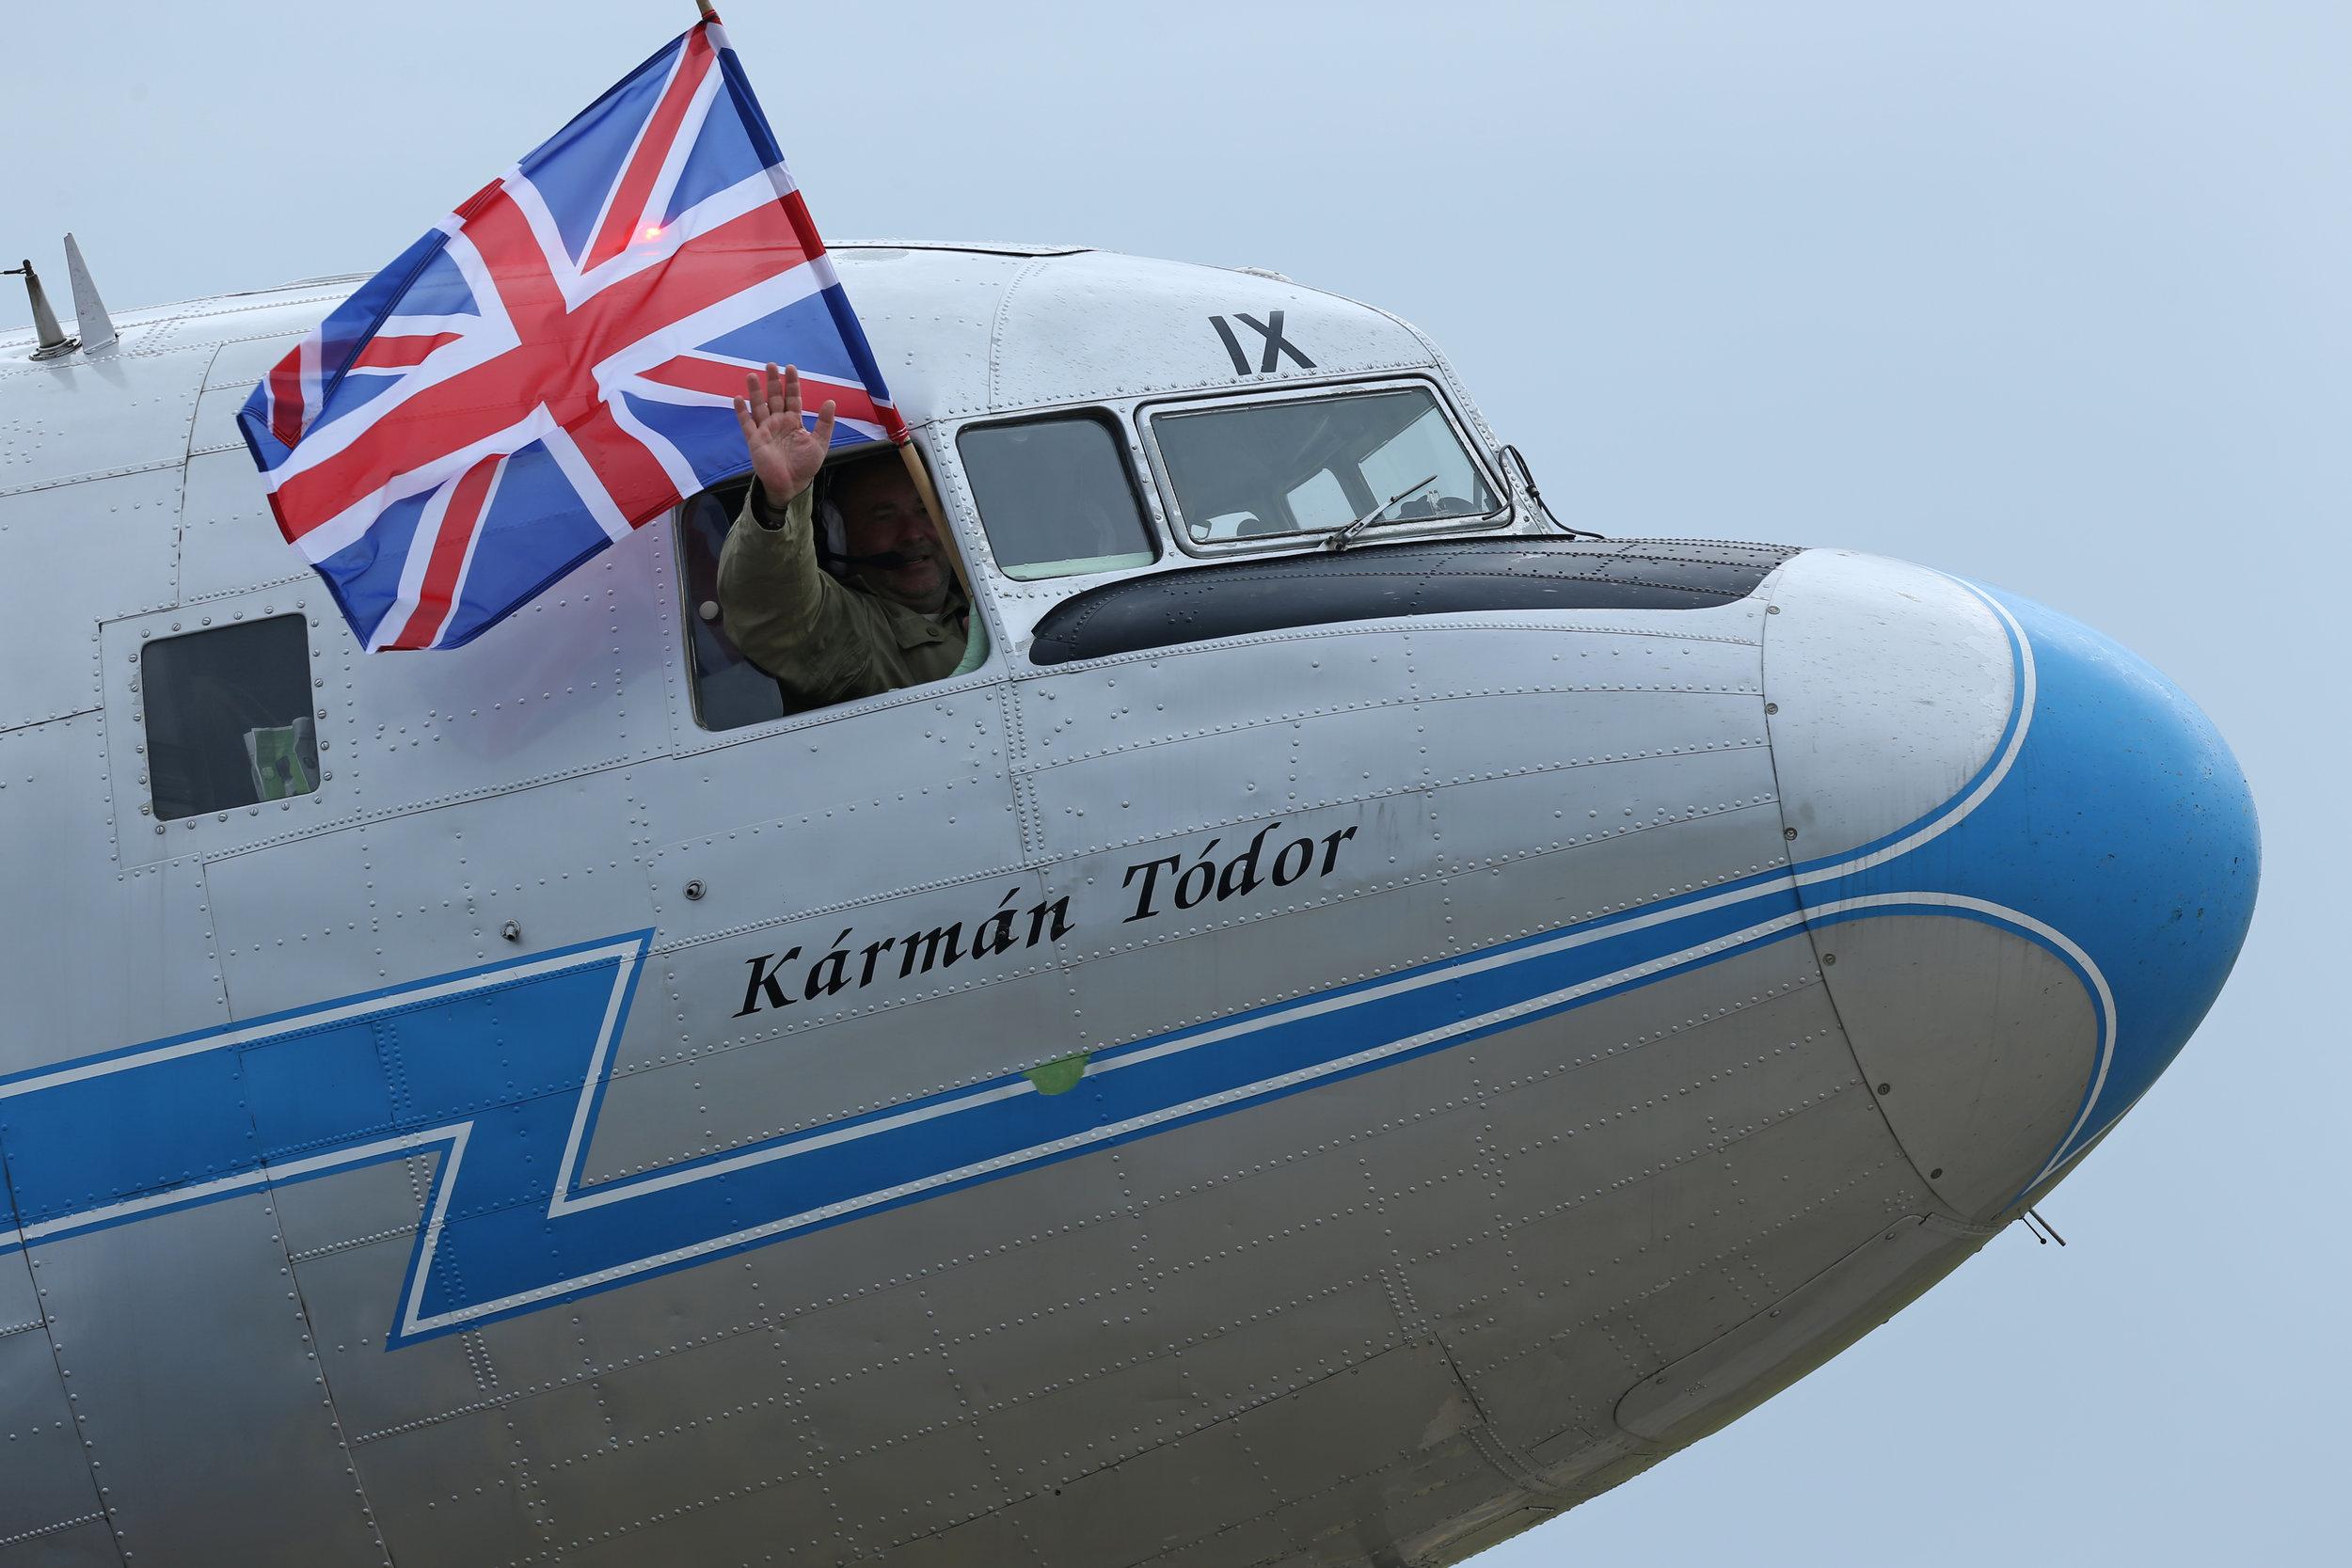 A happy Hungarian Li 2 pilot at Duxford 4th June 2019. Photo: Peter Hampson